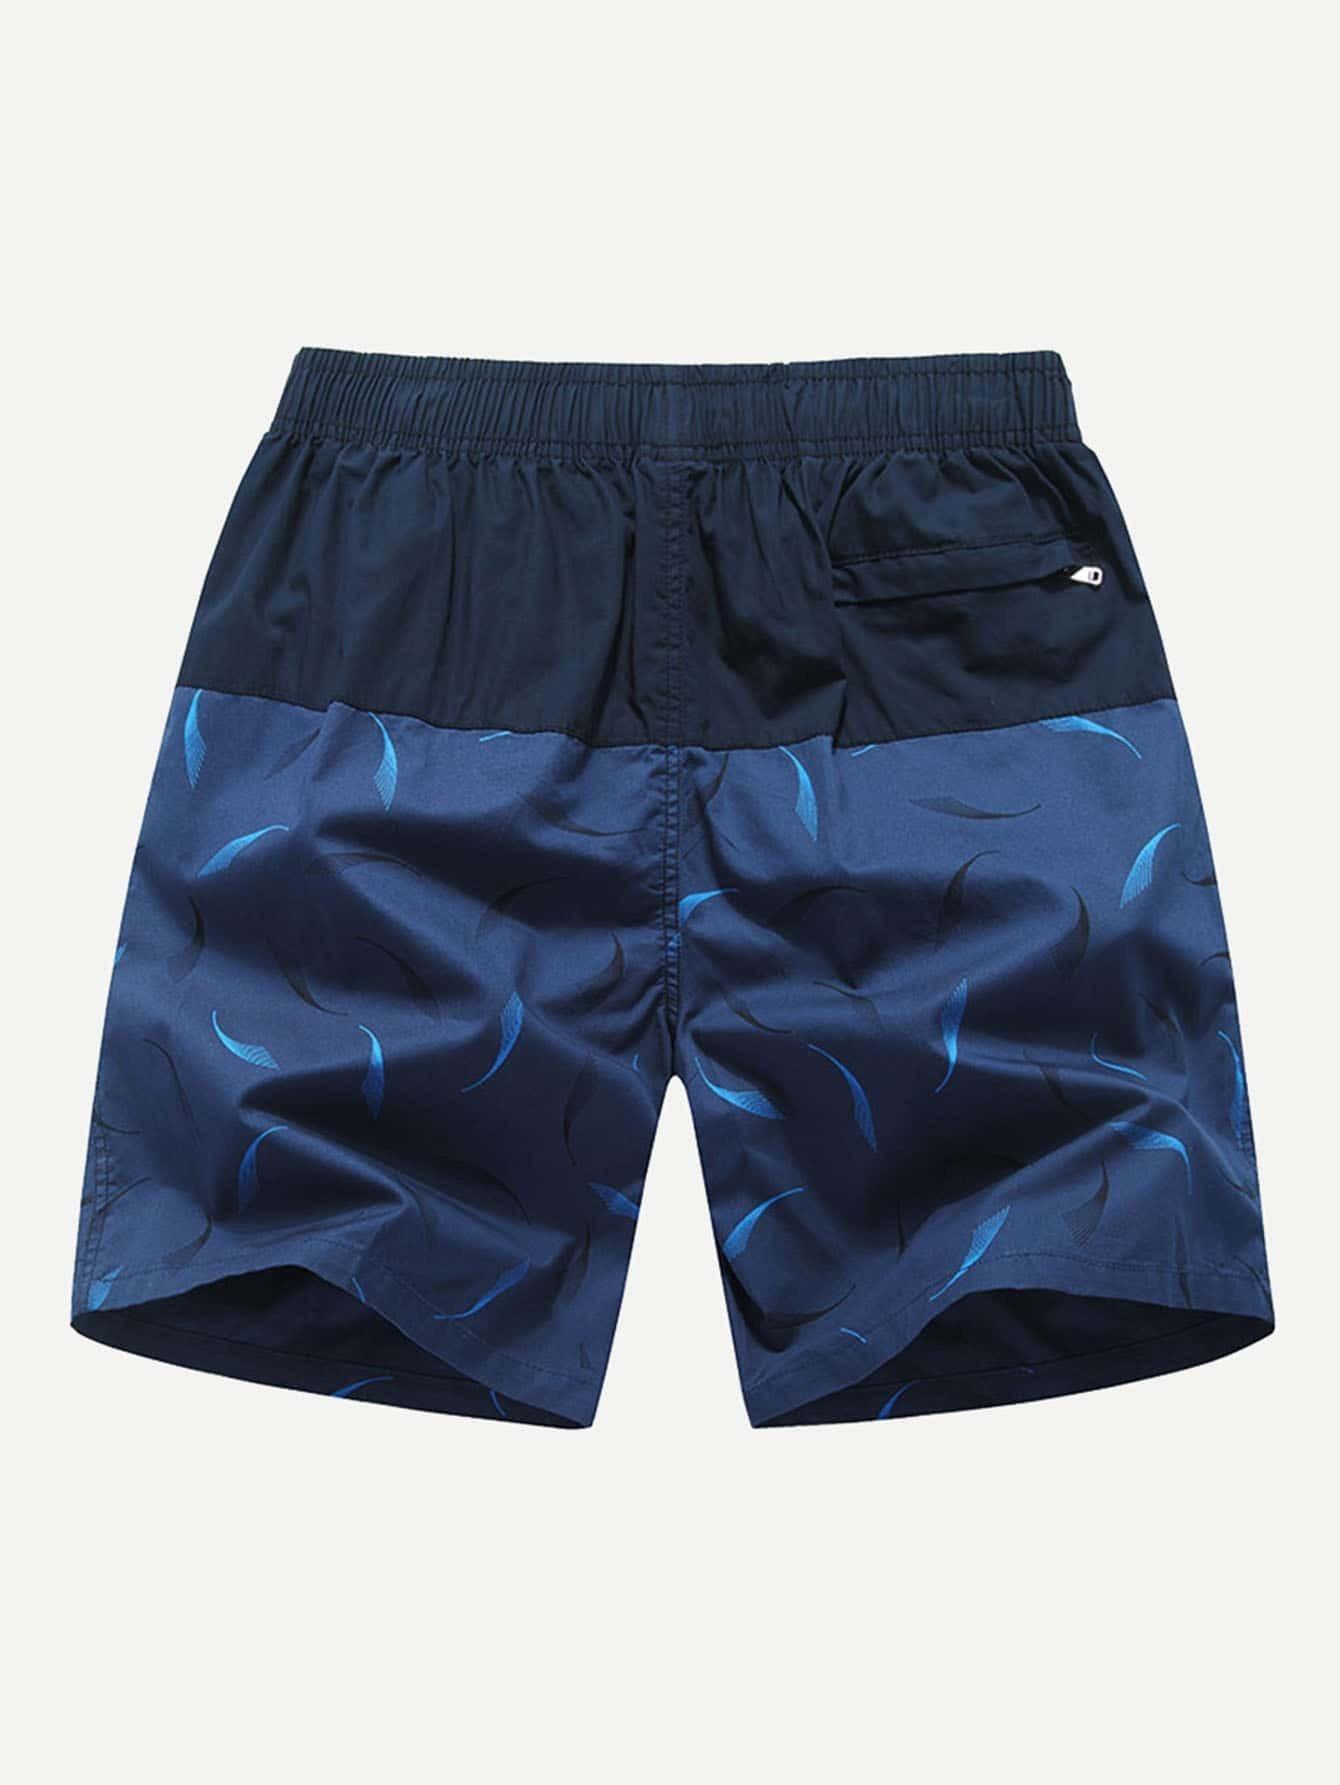 Men Feather Print Color Block Drawstring Waist Shorts stylish drawstring color block pattern print shorts for boy